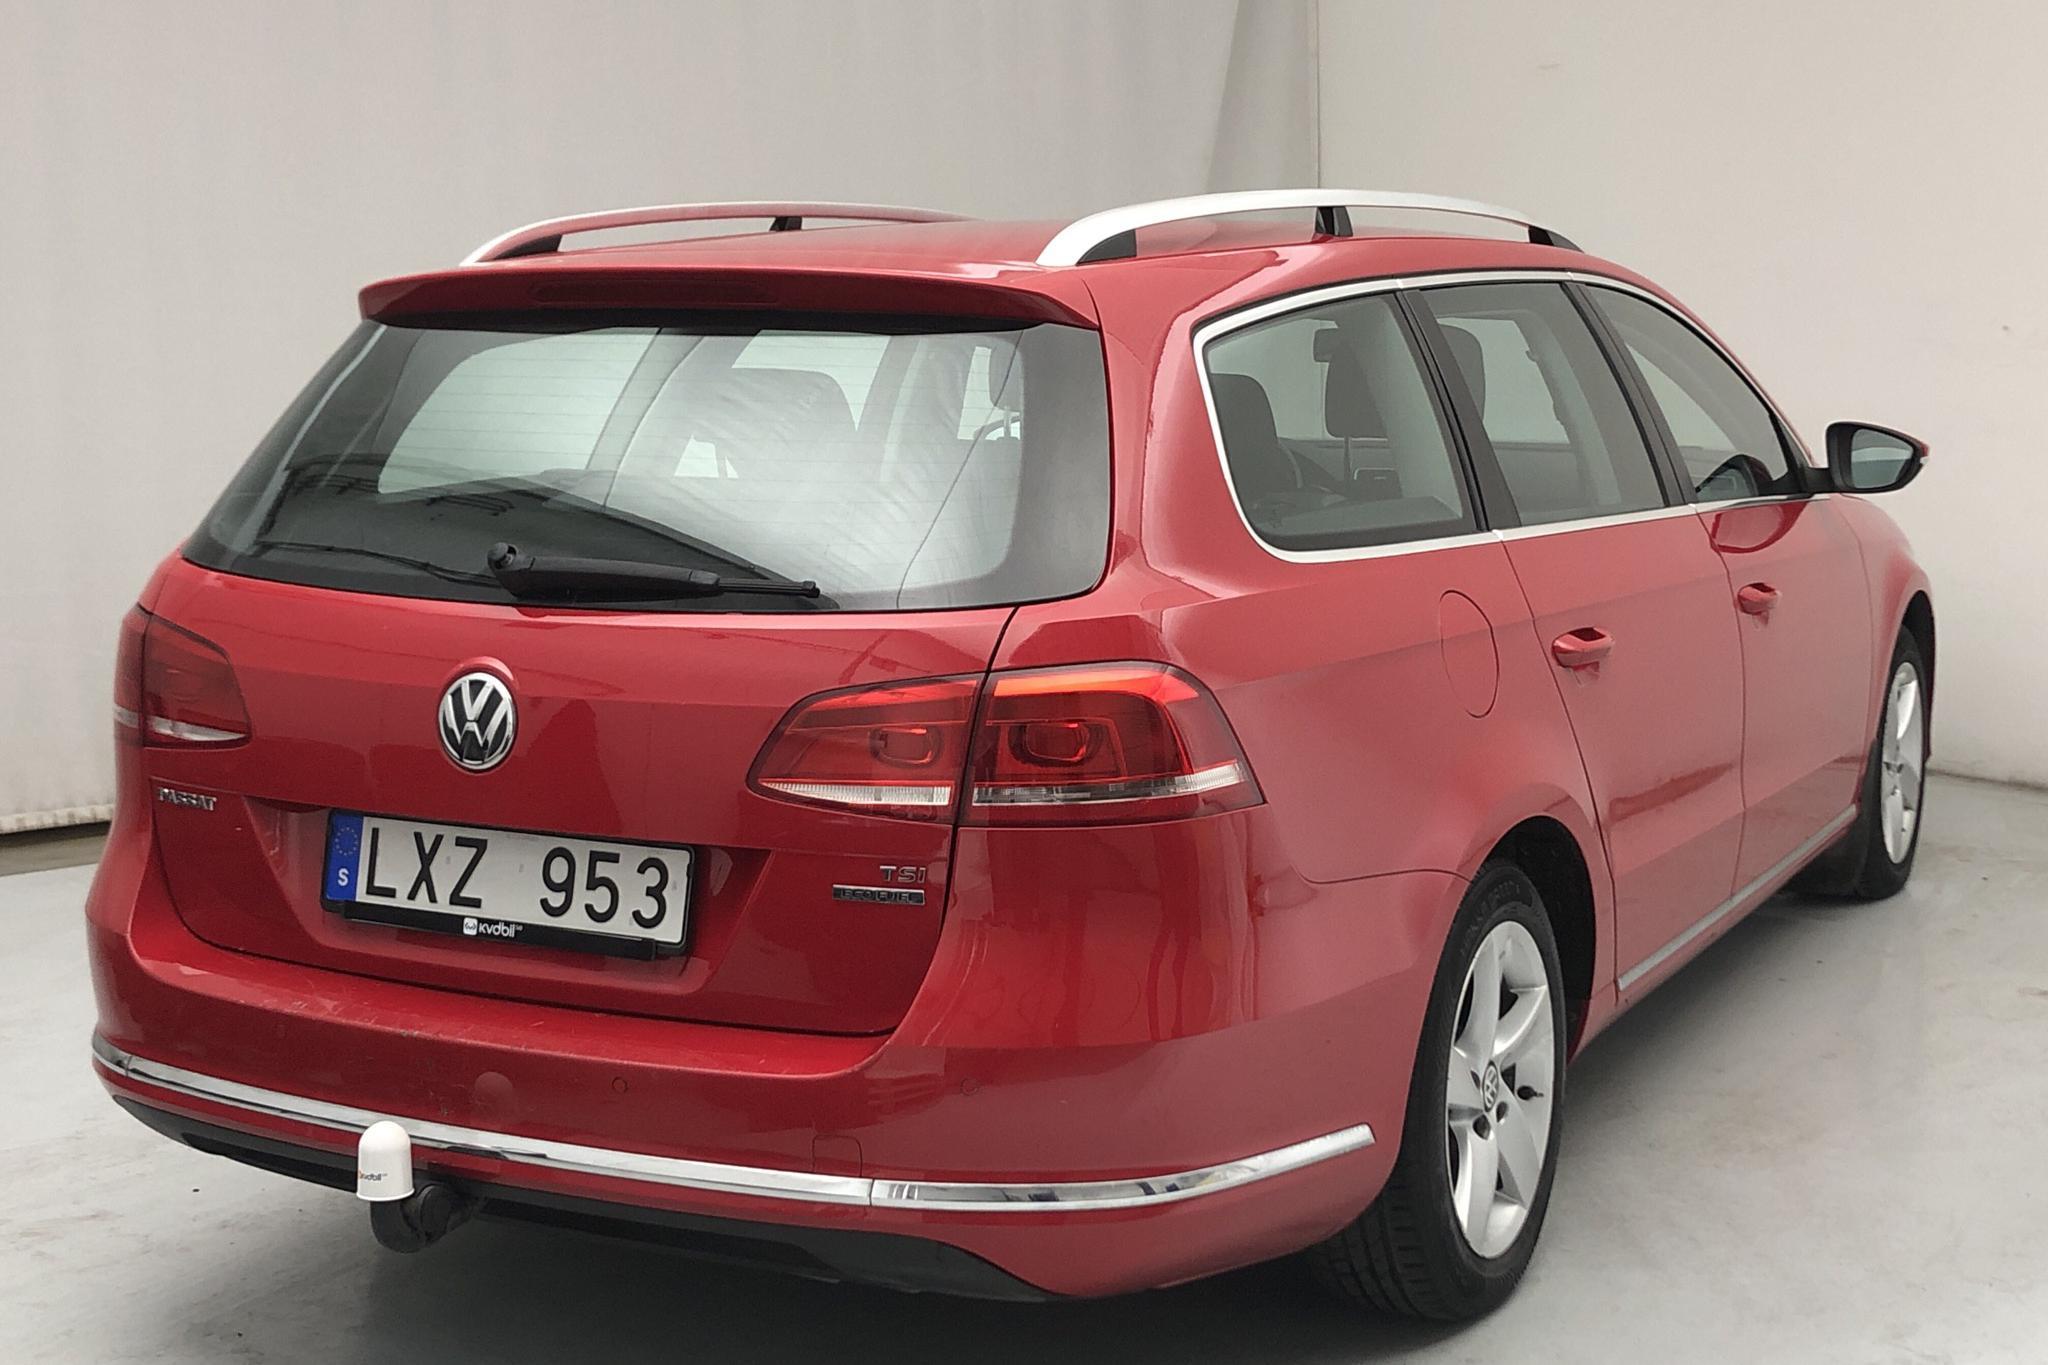 VW Passat 1.4 TSI EcoFuel Variant (150hk) - 8 322 mil - Manuell - röd - 2012